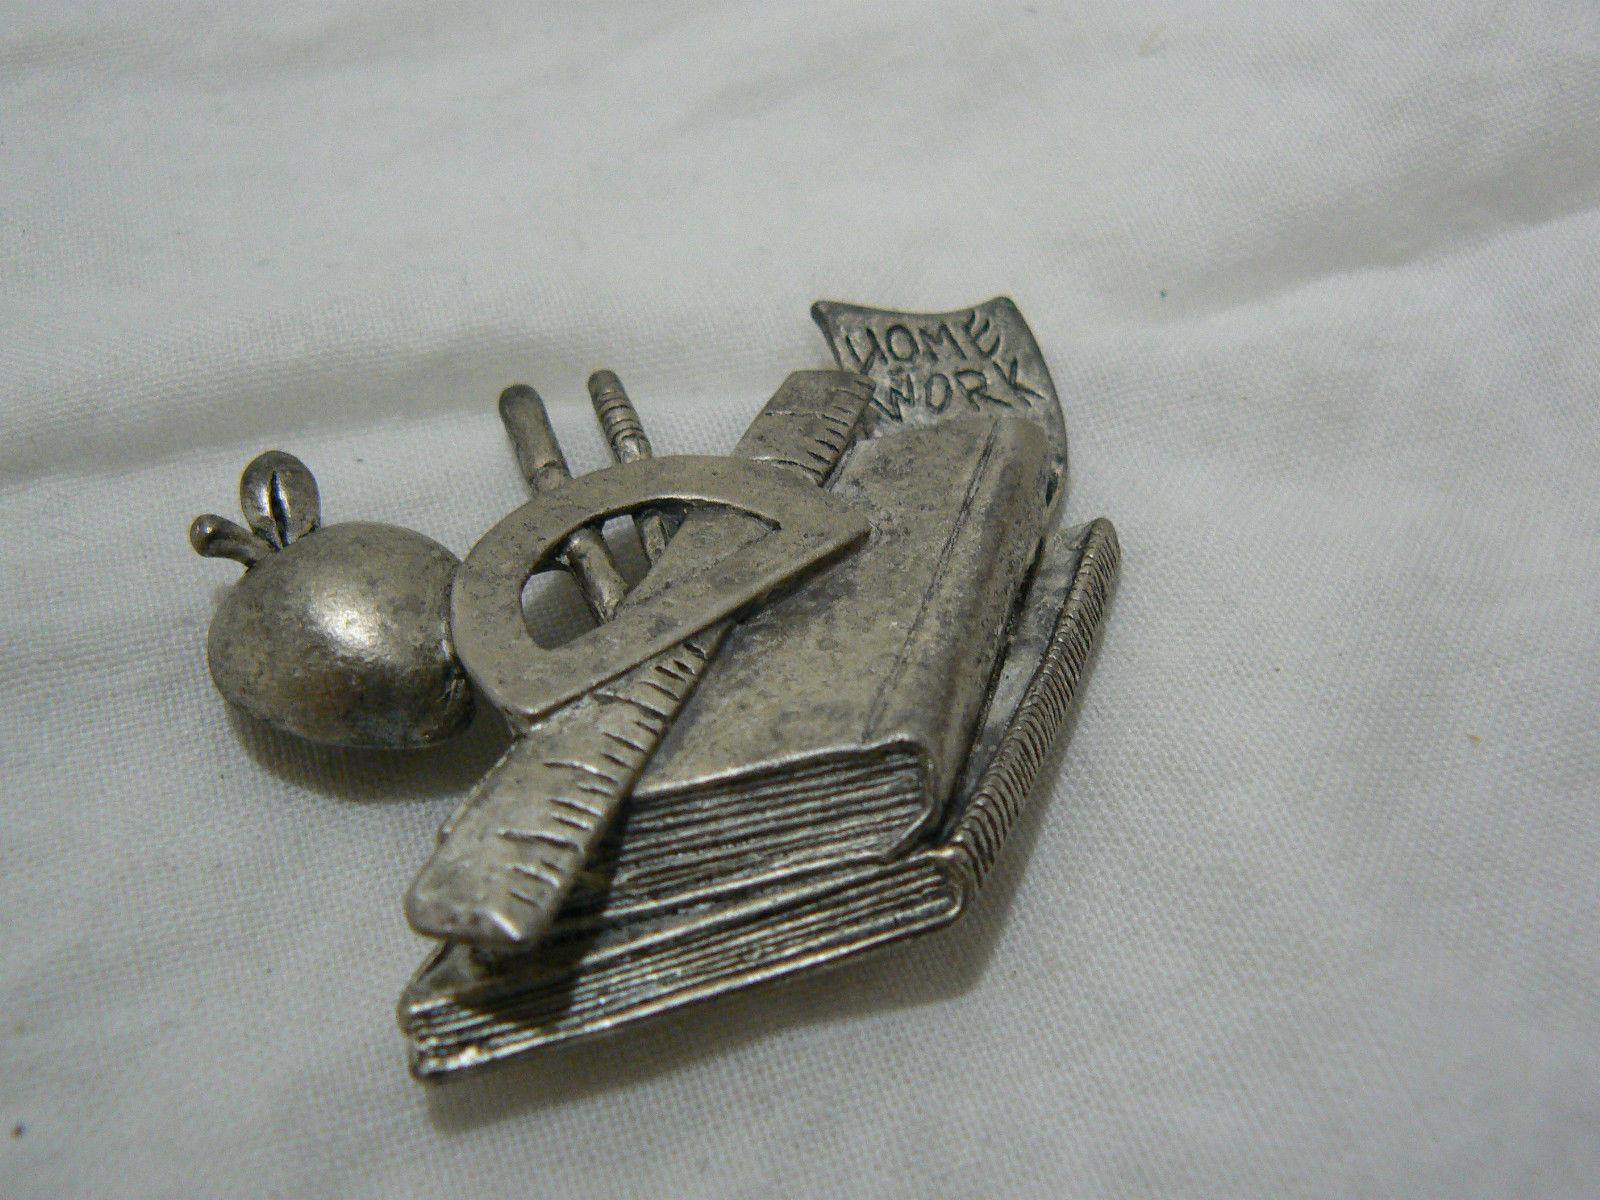 Vintage Unmarked Silvertone Pewter? Teachers Brooch